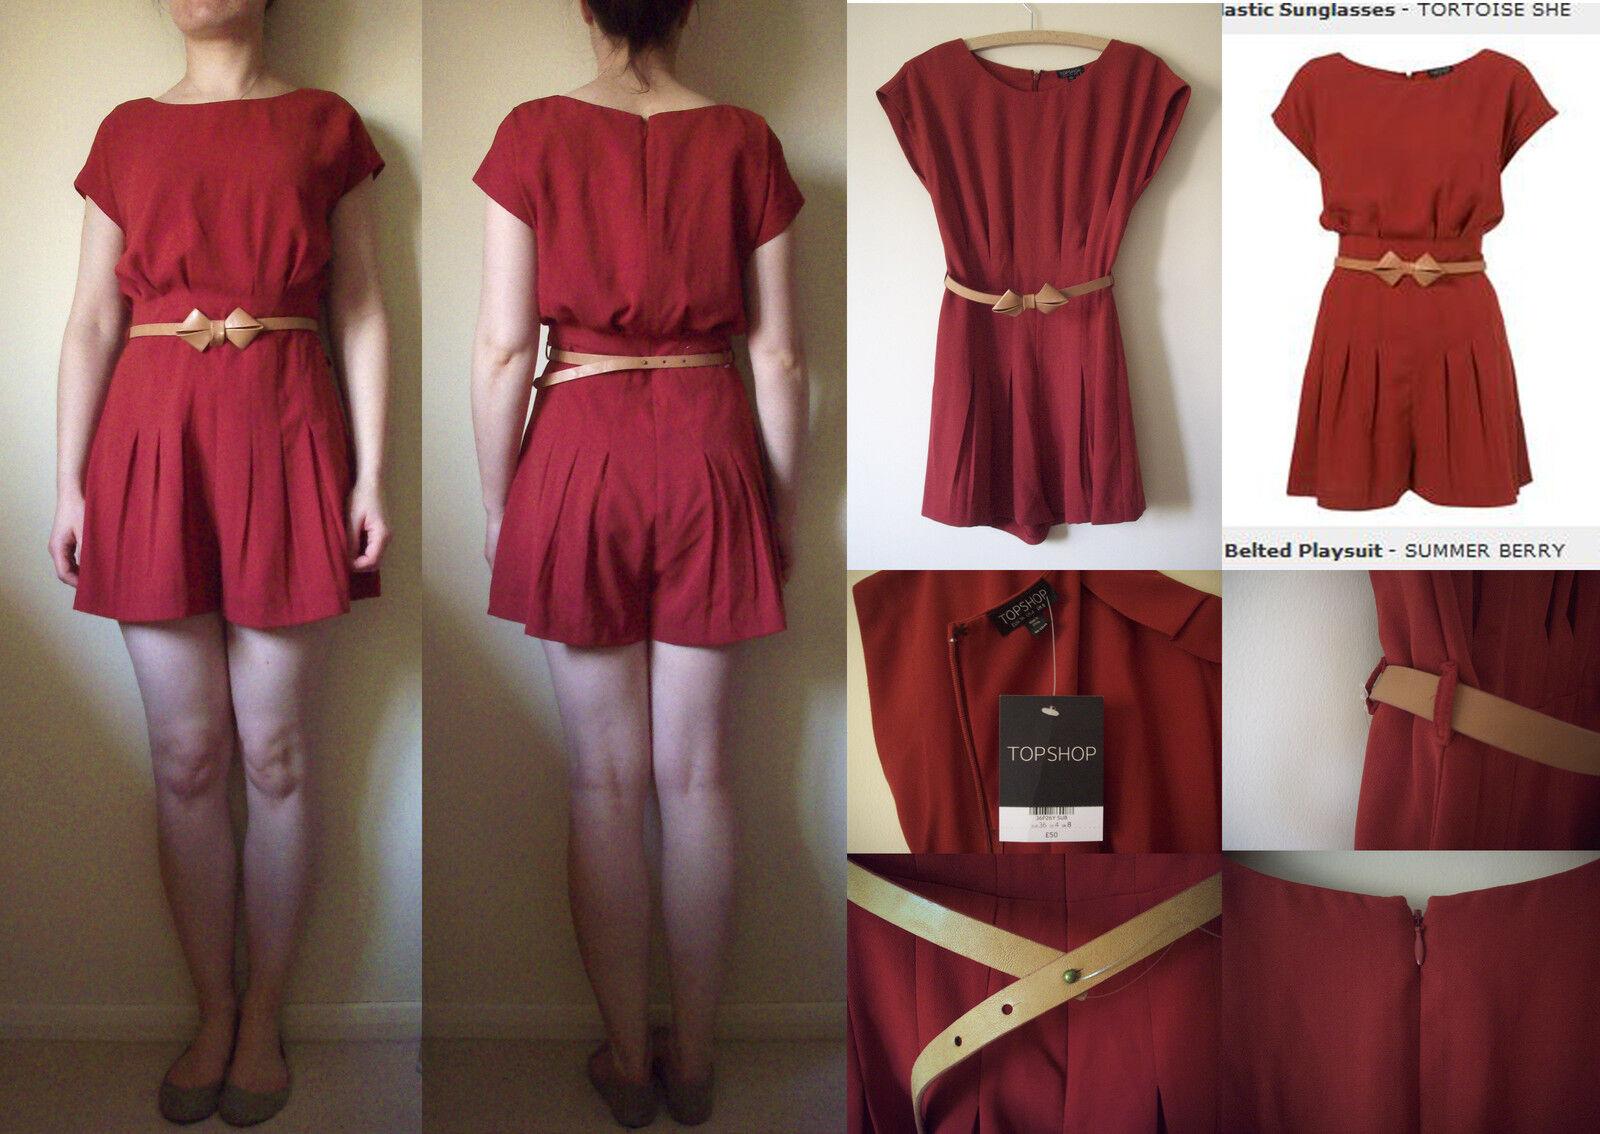 TOPSHOP Berry Red Short Retro Vintage Playsuit Romper Jumpsuit 8 36 NWT £50